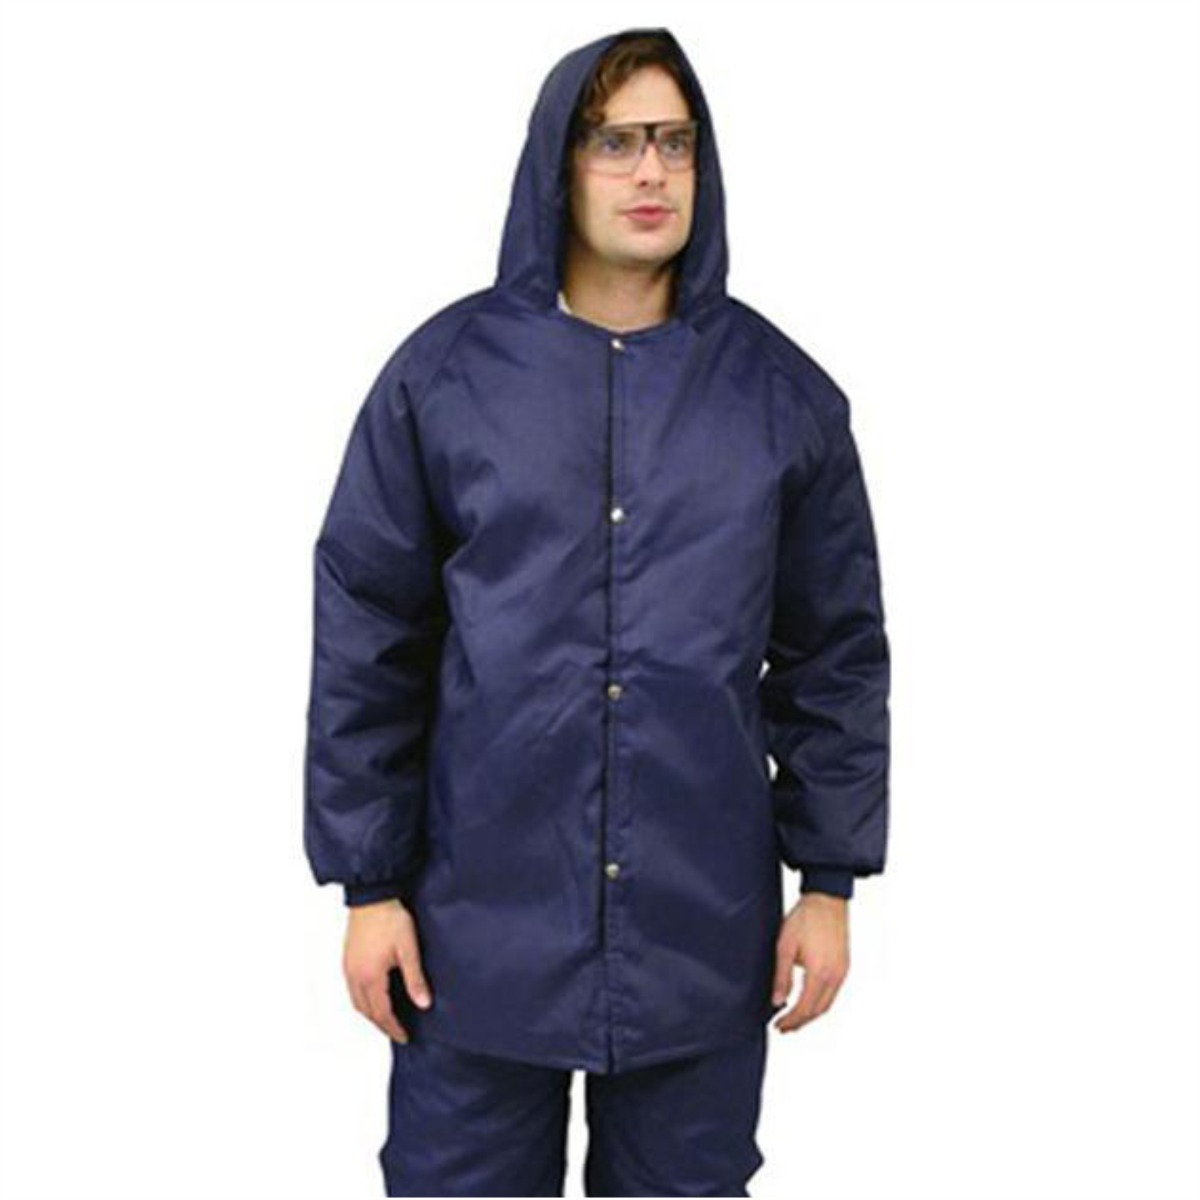 38618943a5836 Blusa Térmica Maicol Azul -35 Graus Camara Fria - R  89